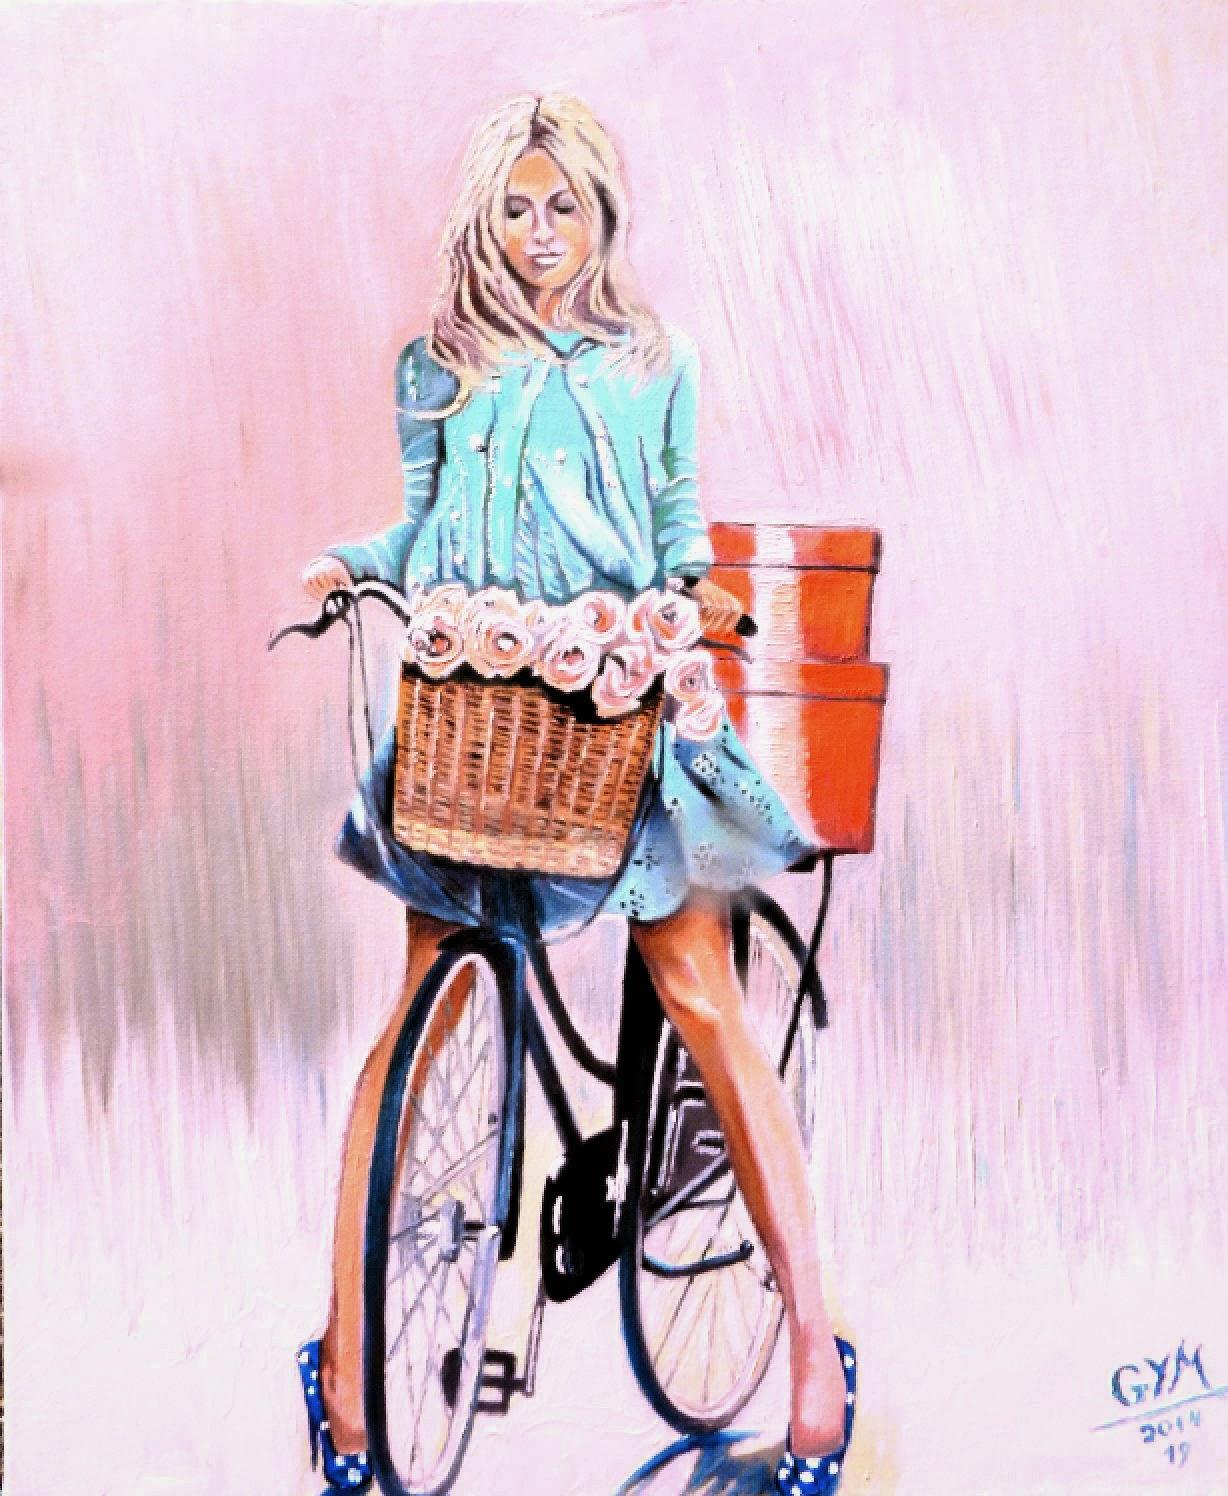 peintures de gym jeune femme v lo paris hst 15 f. Black Bedroom Furniture Sets. Home Design Ideas